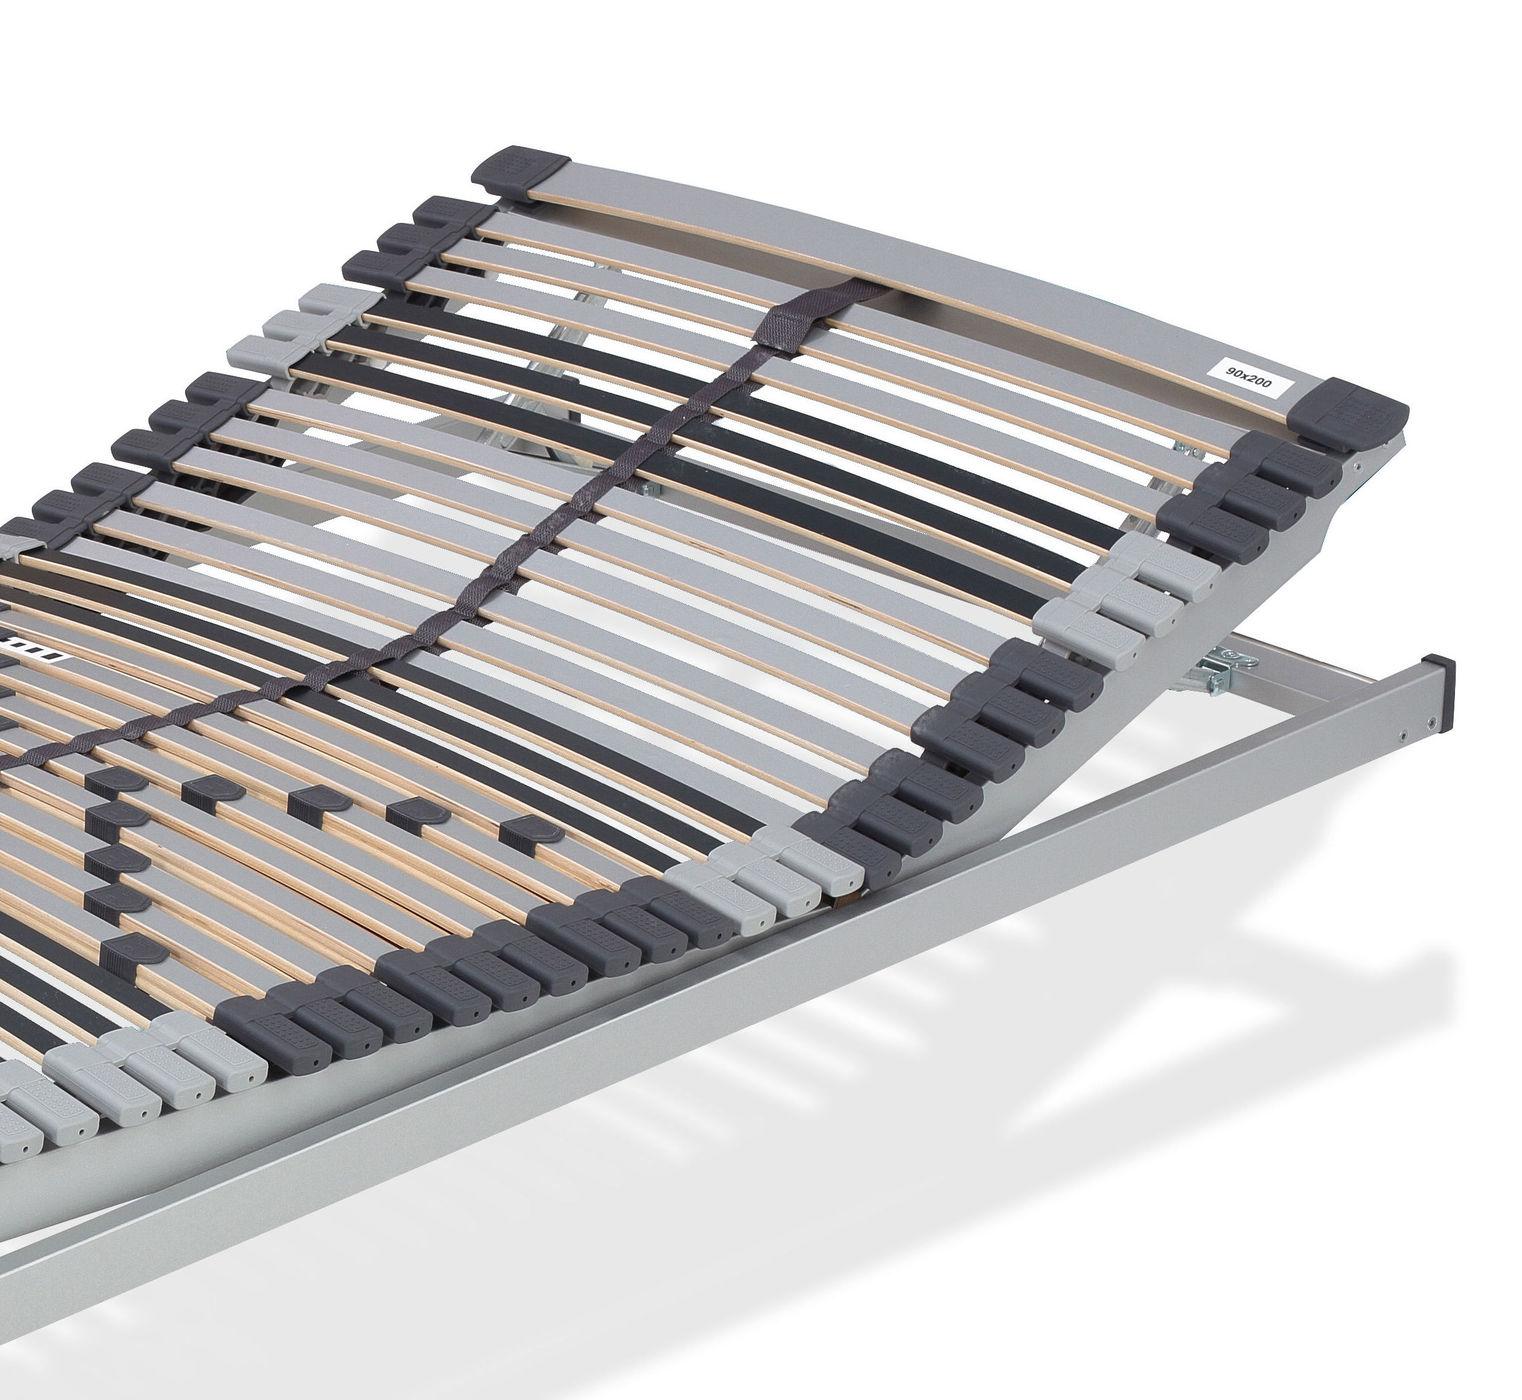 MALIE-Lattenrost 7 Zonen bis 120 kg - Classic Superflex 42